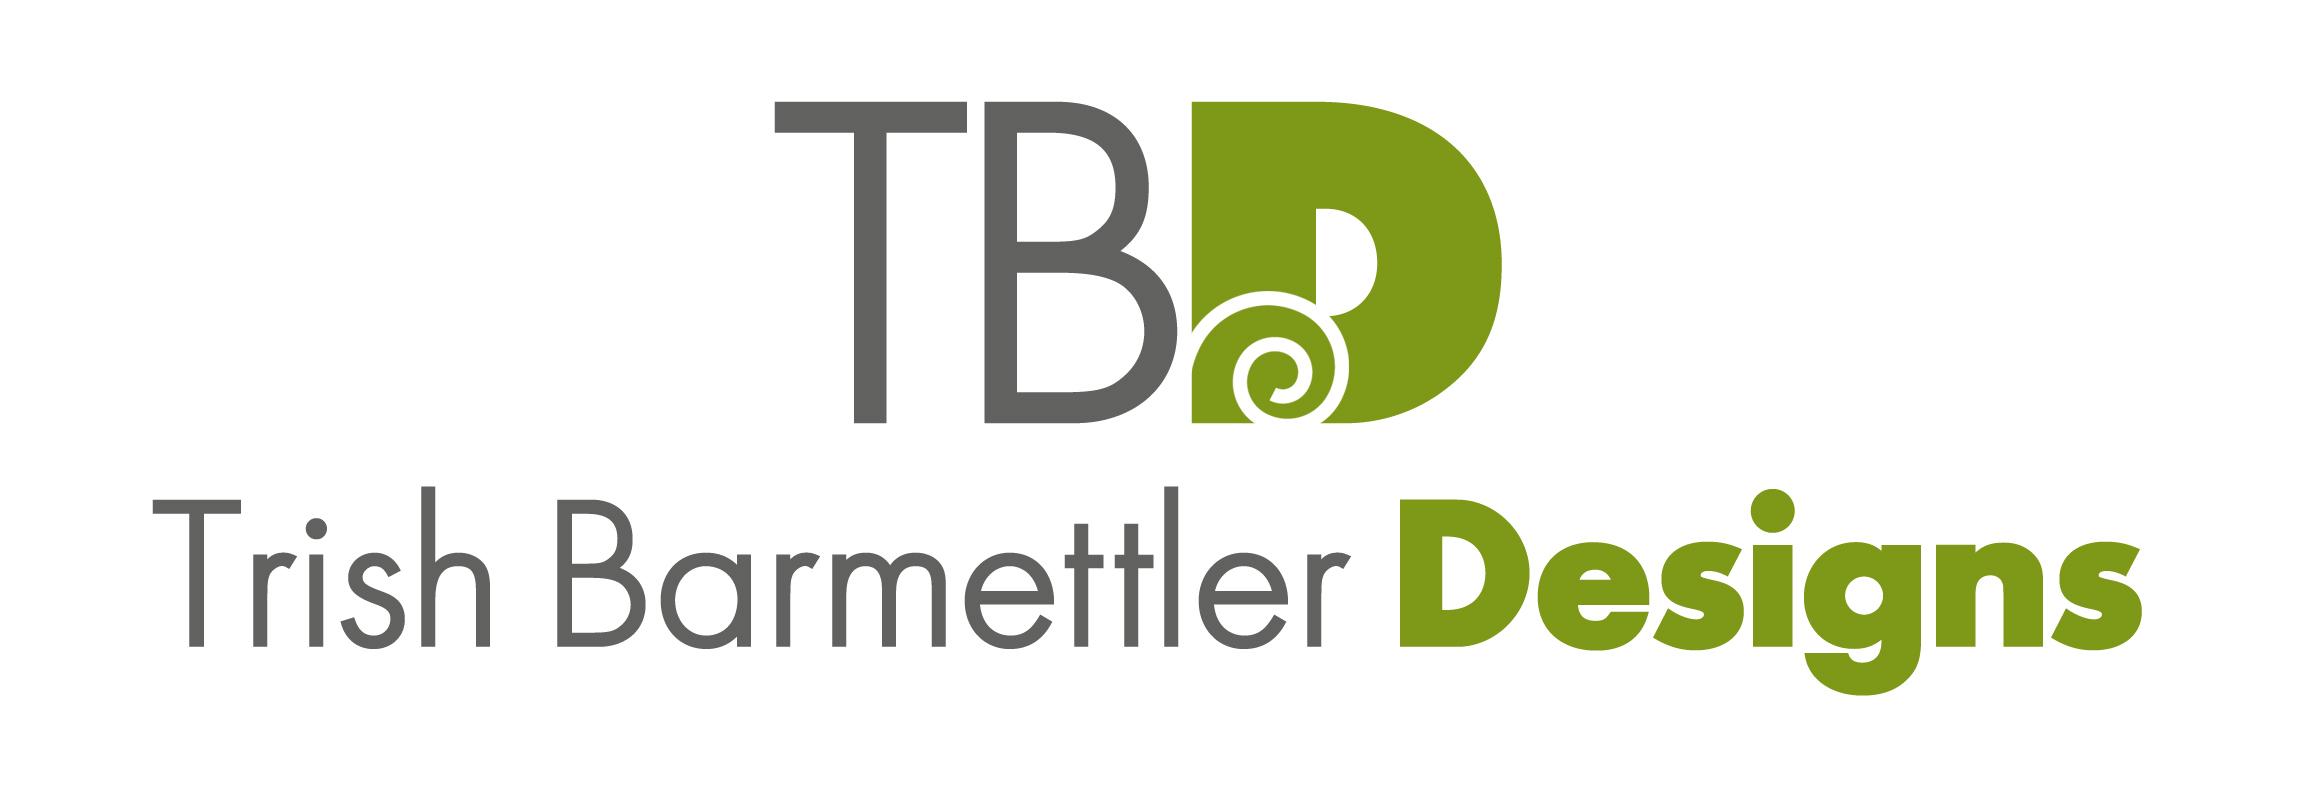 TB Blinds and Design - Full Service Interior Design Firm in Omaha, Nebraska